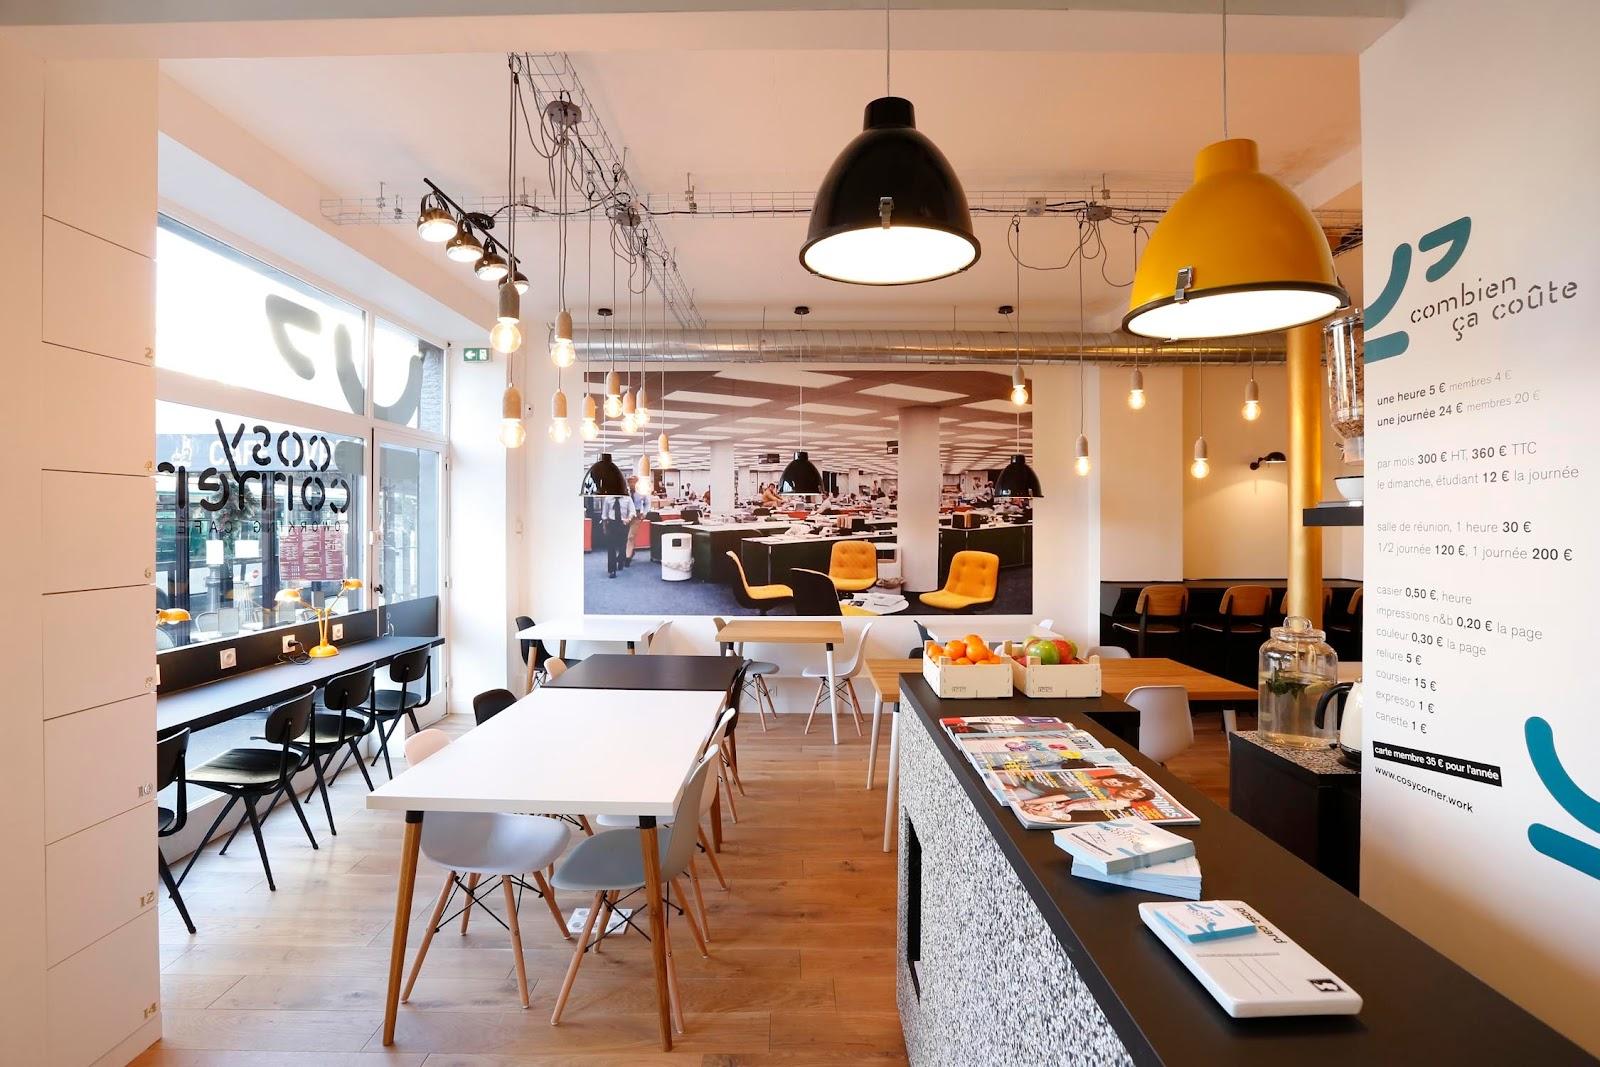 Cosy Corner Coworking Space in Paris